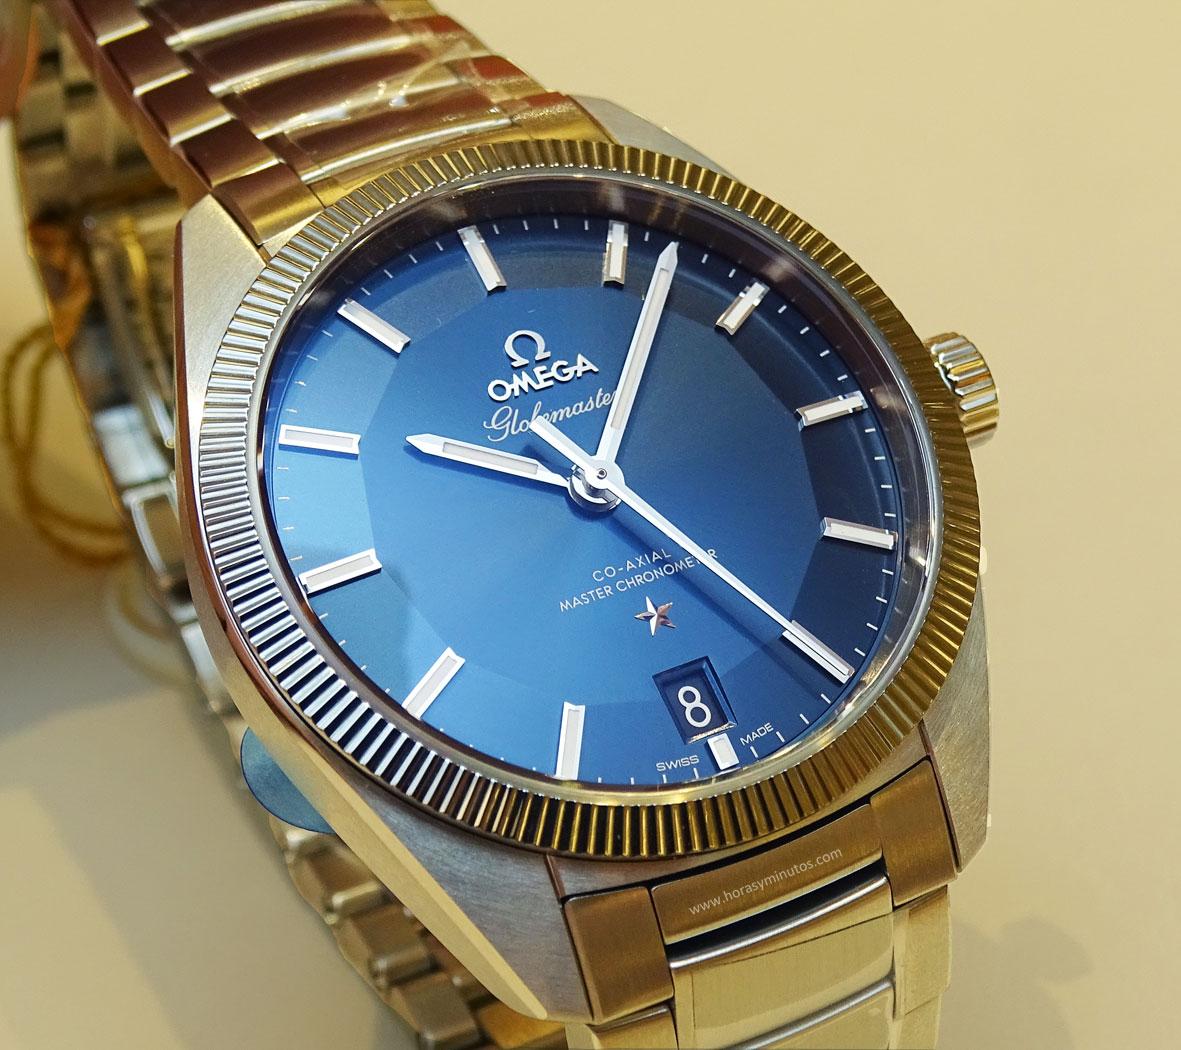 OMEGA-Globemaster-Master-Chronometer-acero-esfera-azul-Horas-y-Minutos